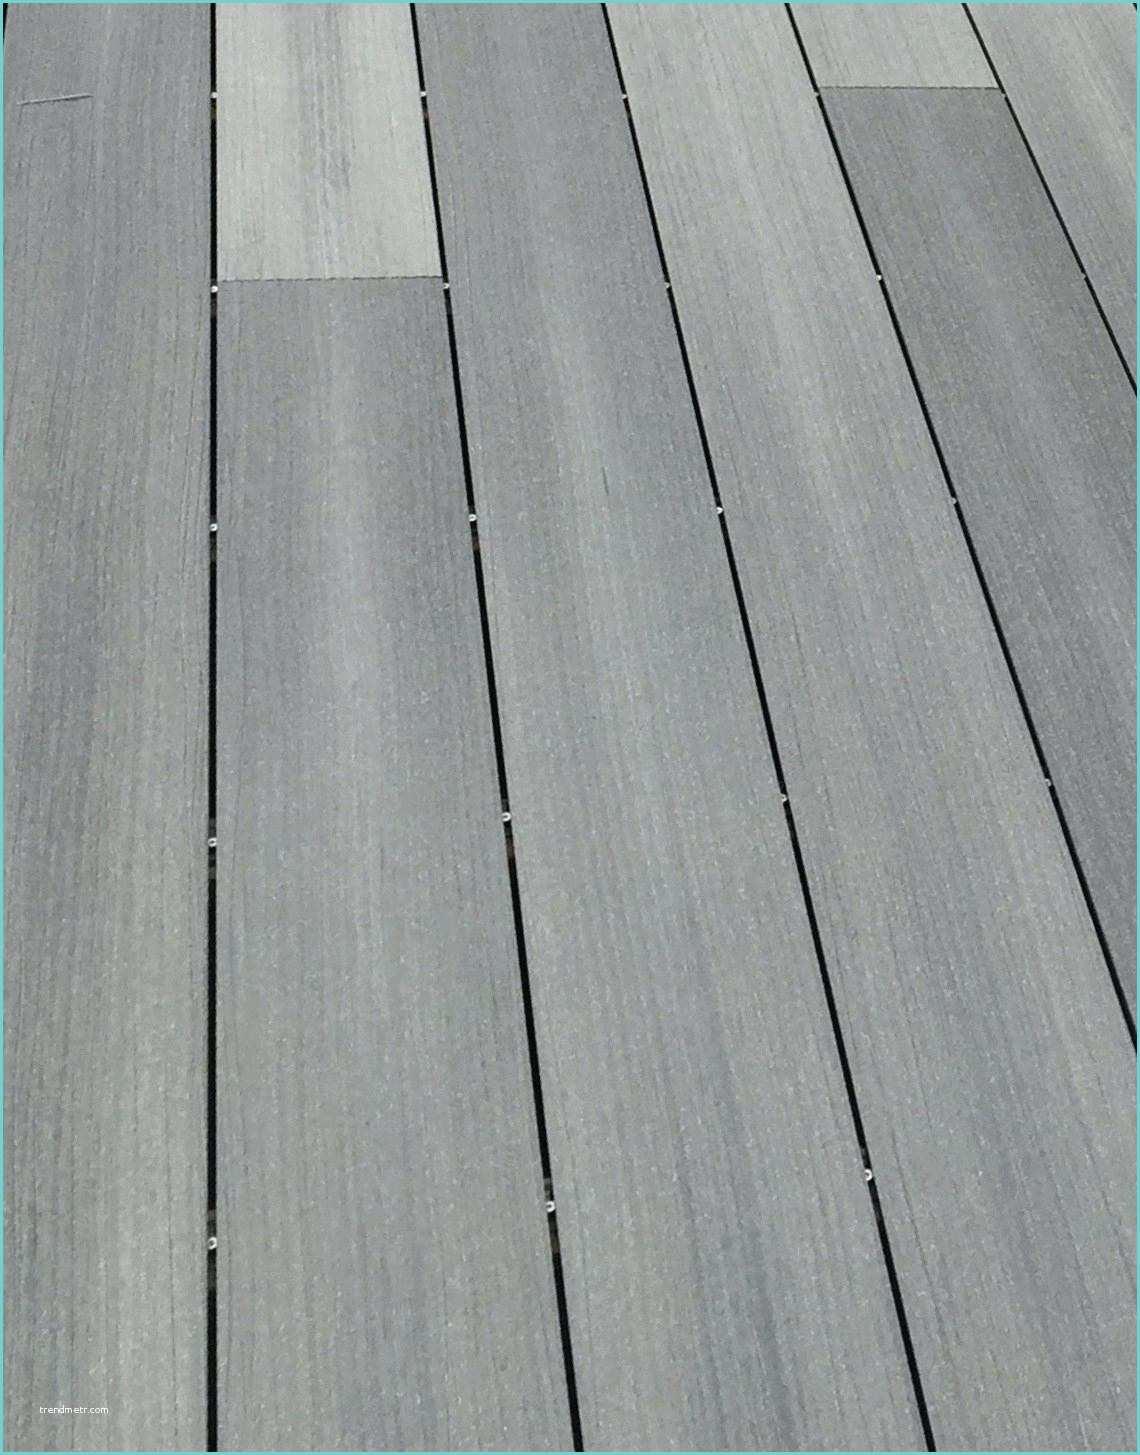 46 Lame De Terrasse Composite Brico Depot   Trendmetr pour Lame De Terrasse Composite Brico Depot